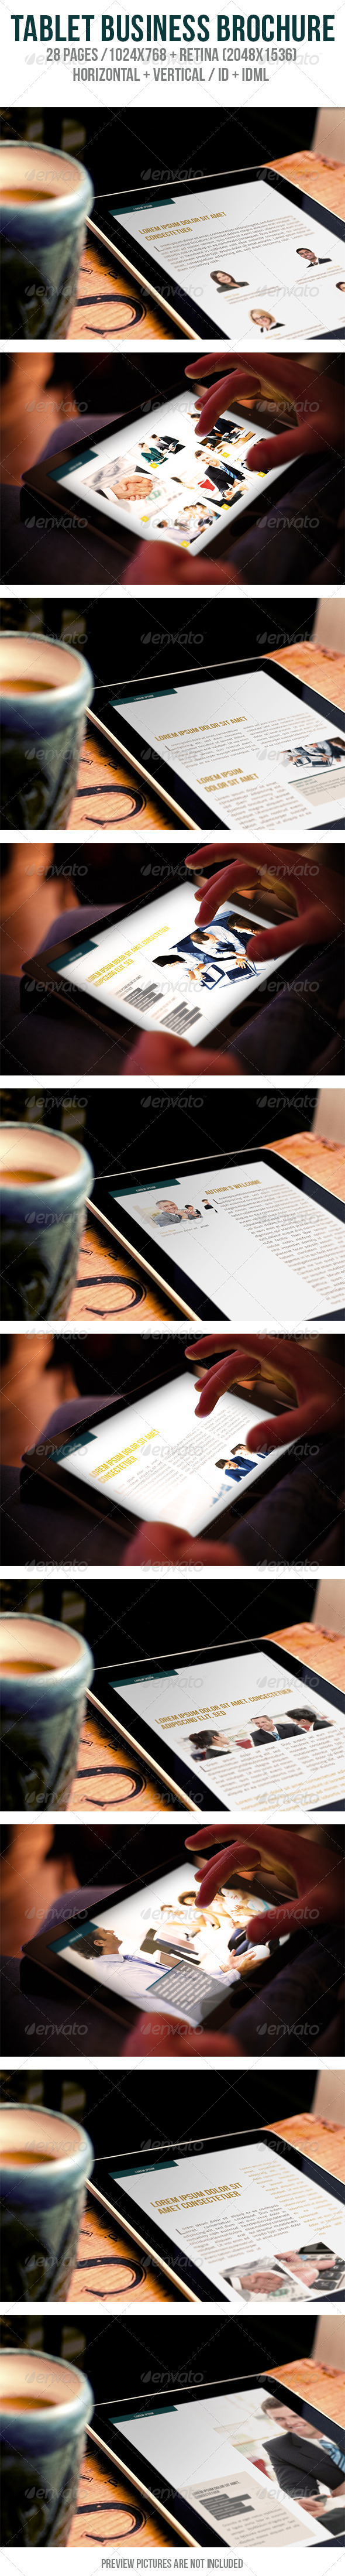 iPad & Tablet Business Brochure - Digital Magazines ePublishing